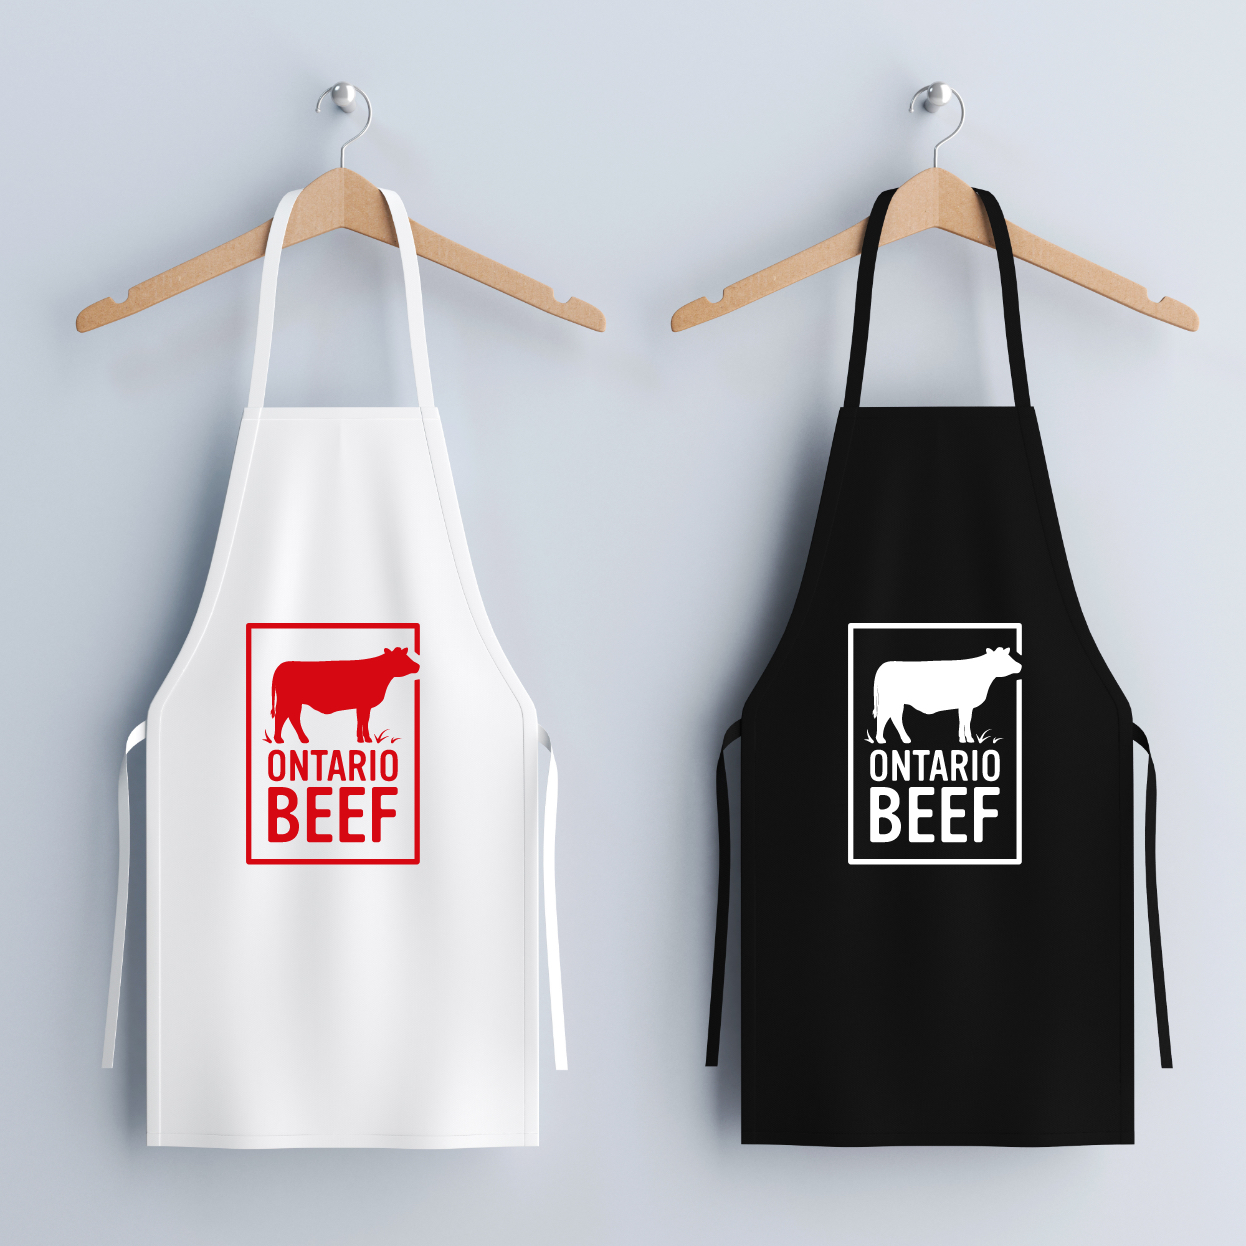 Ontario beef logo